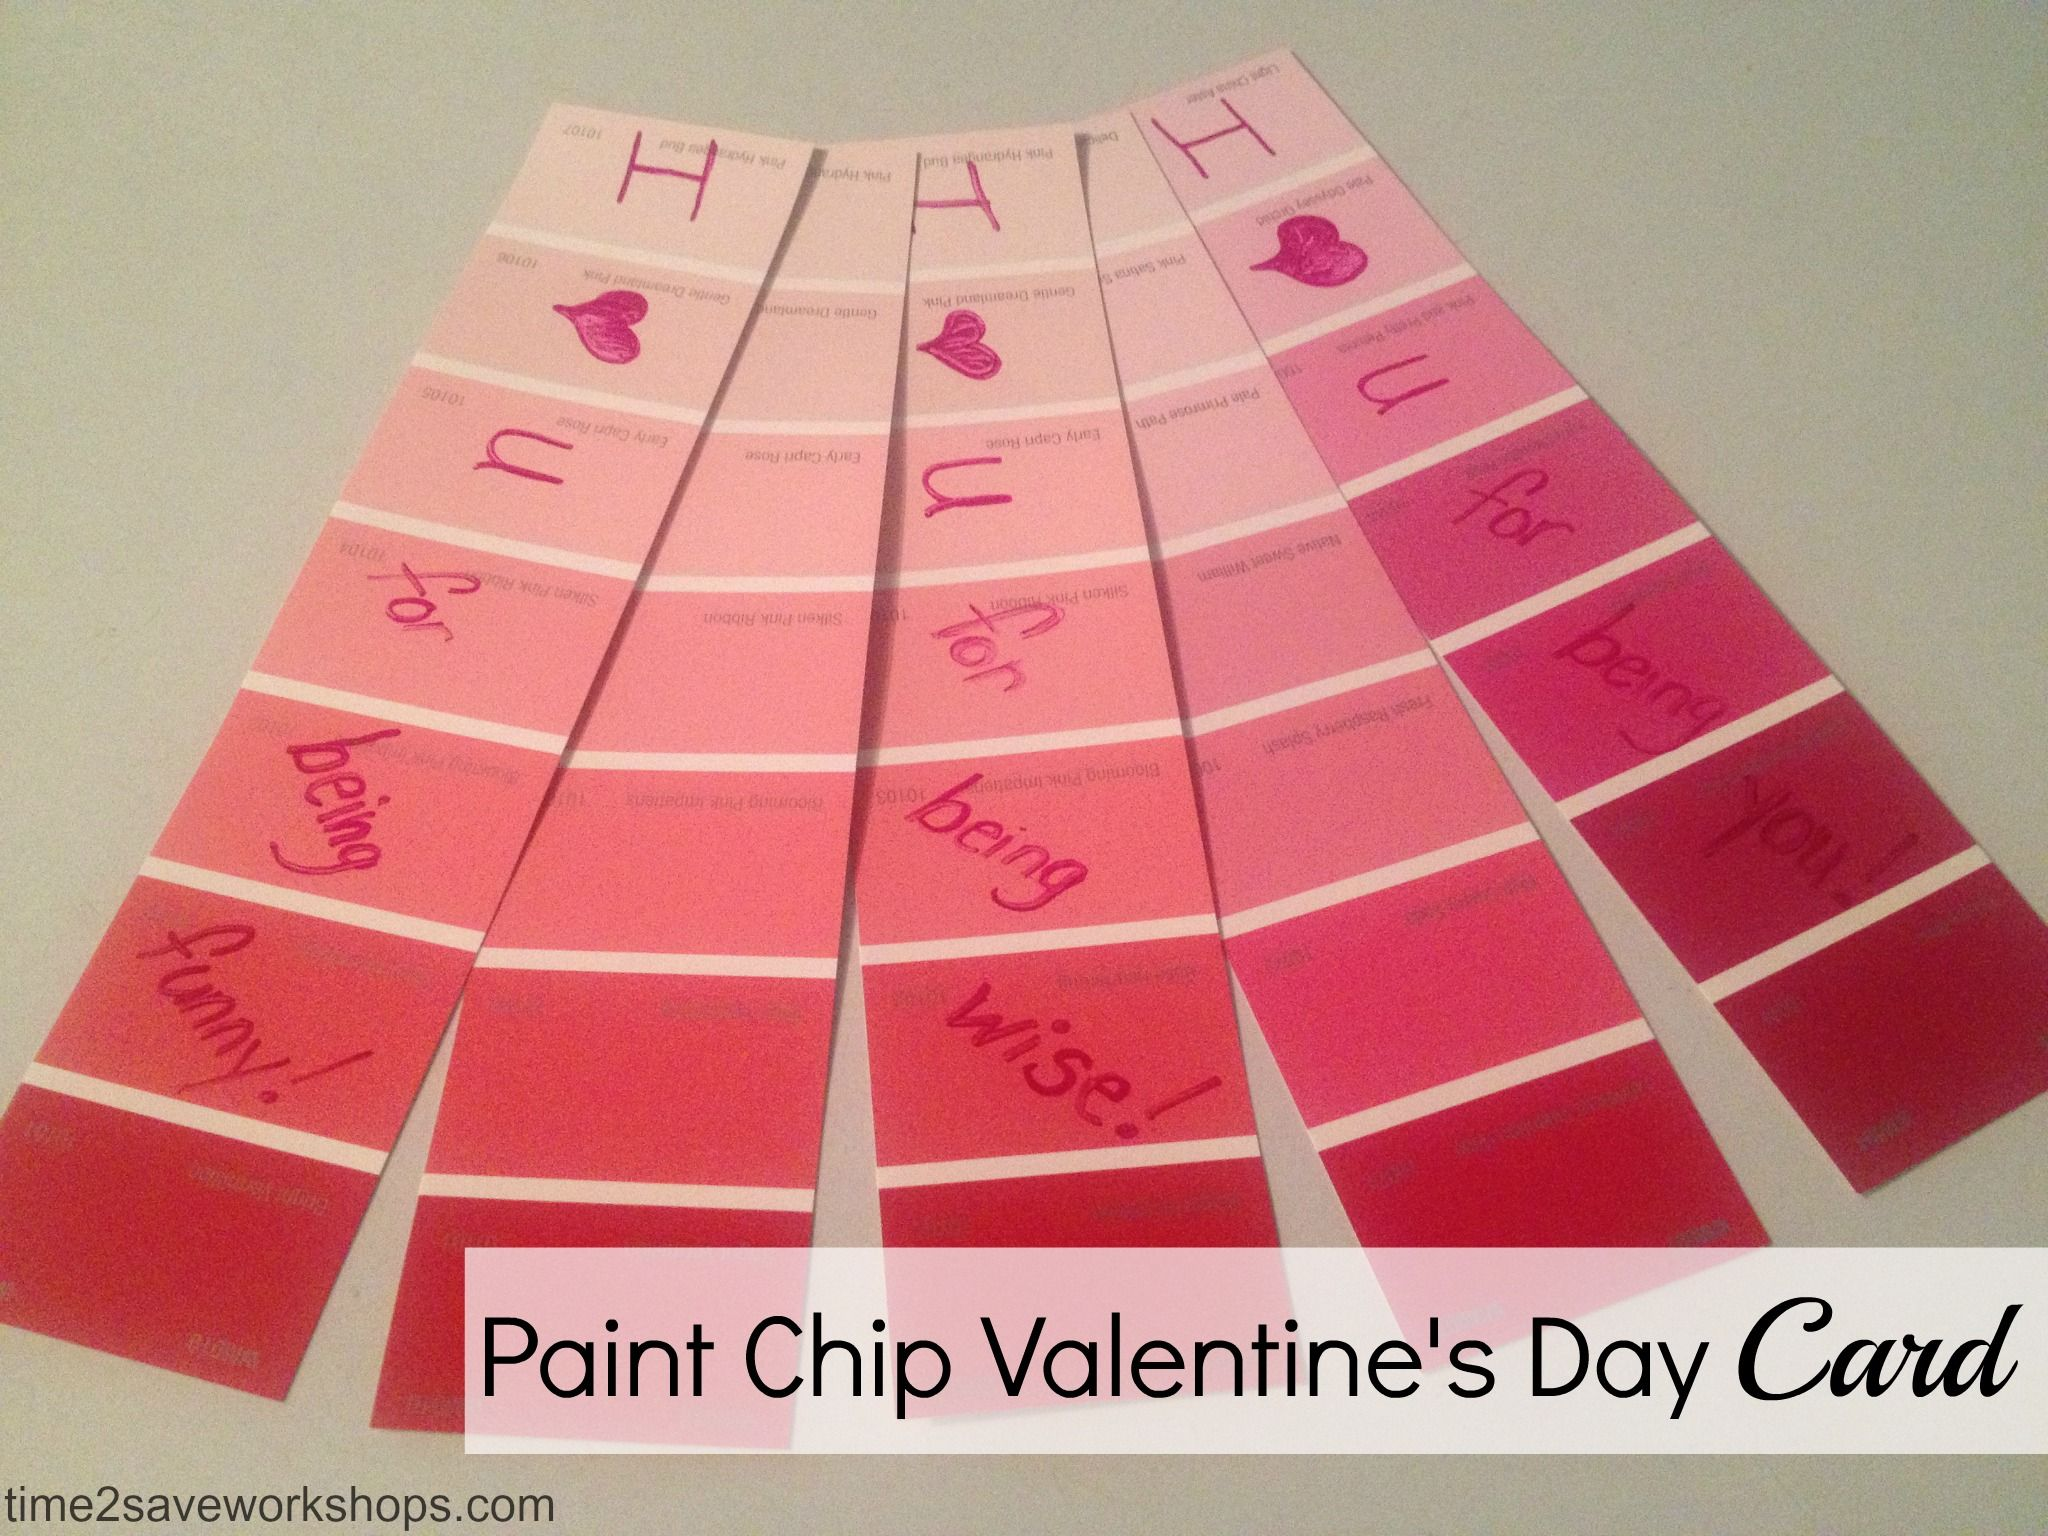 Cheap Valentines Ideas Diy Paint Chip Valentine S Day